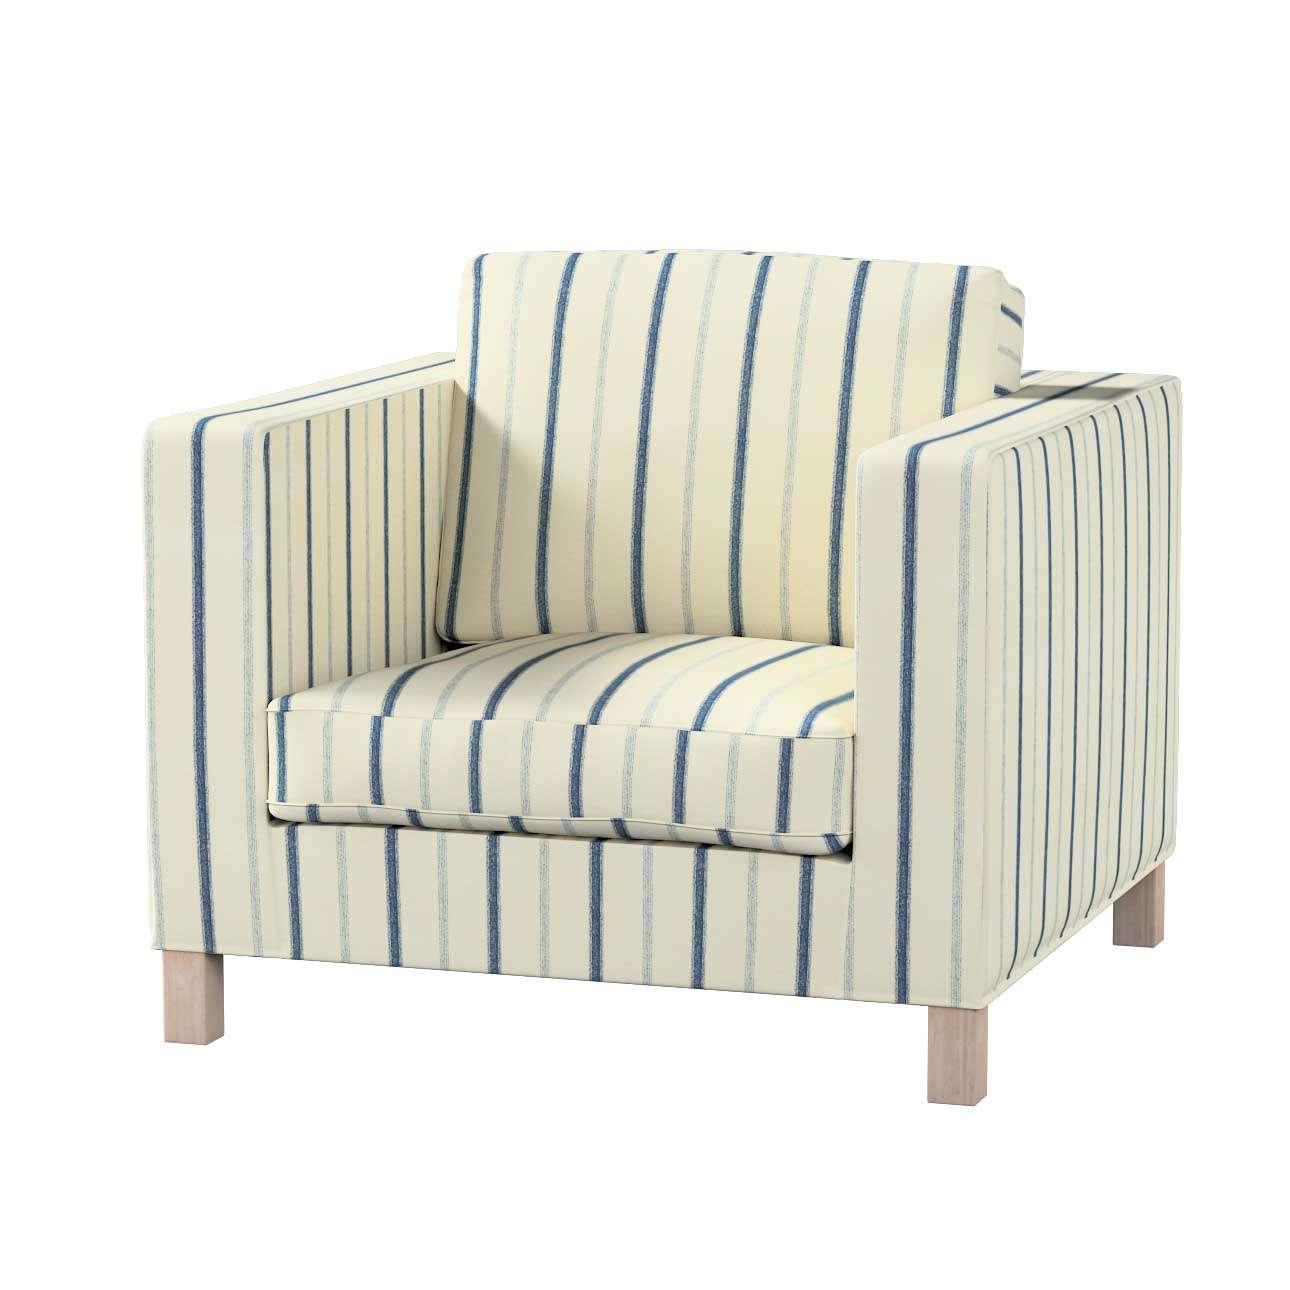 Pokrowiec na fotel Karlanda, krótki fotel Karlanda w kolekcji Avinon, tkanina: 129-66